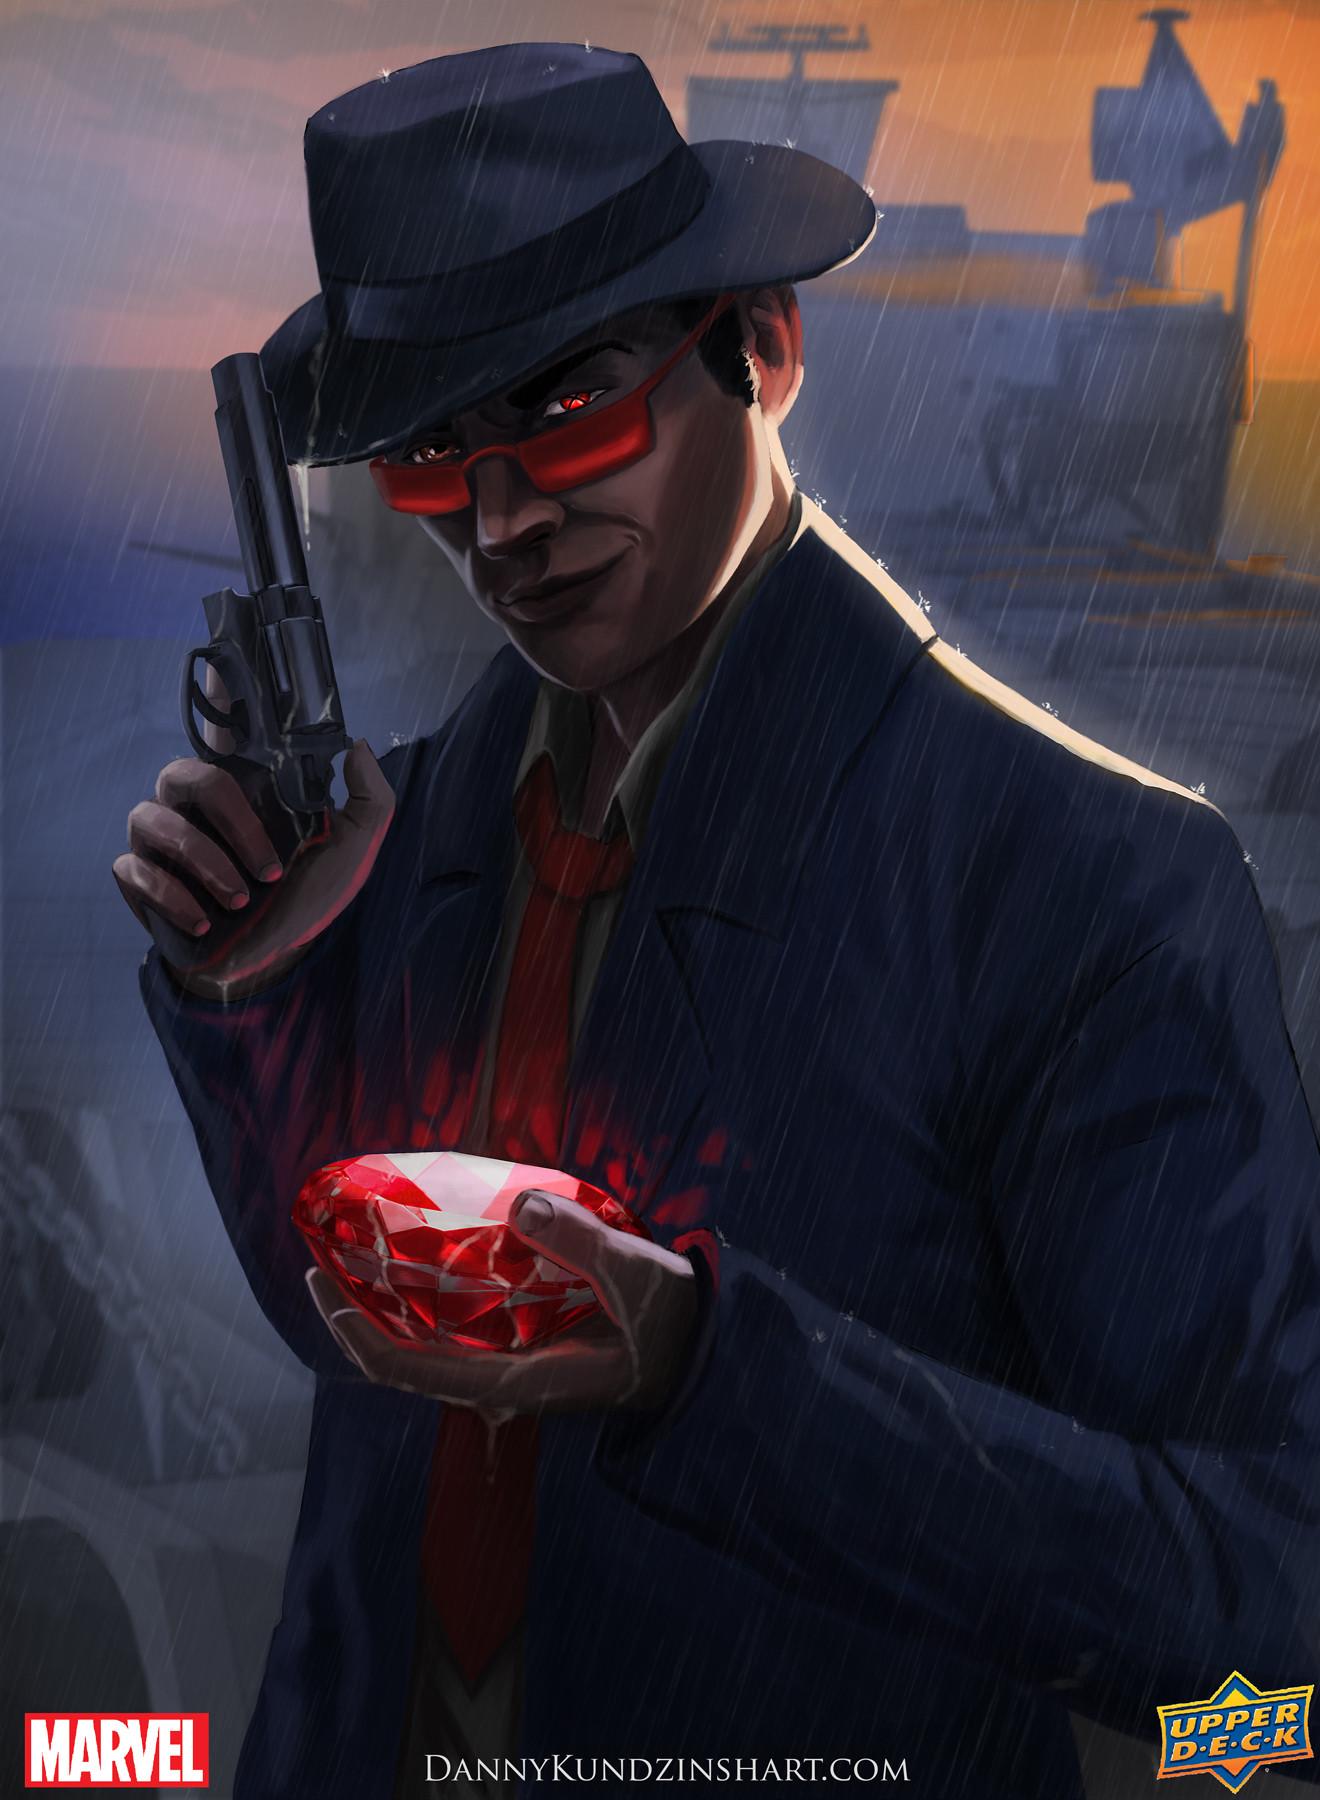 Danny kundzinsh cyclops forweb